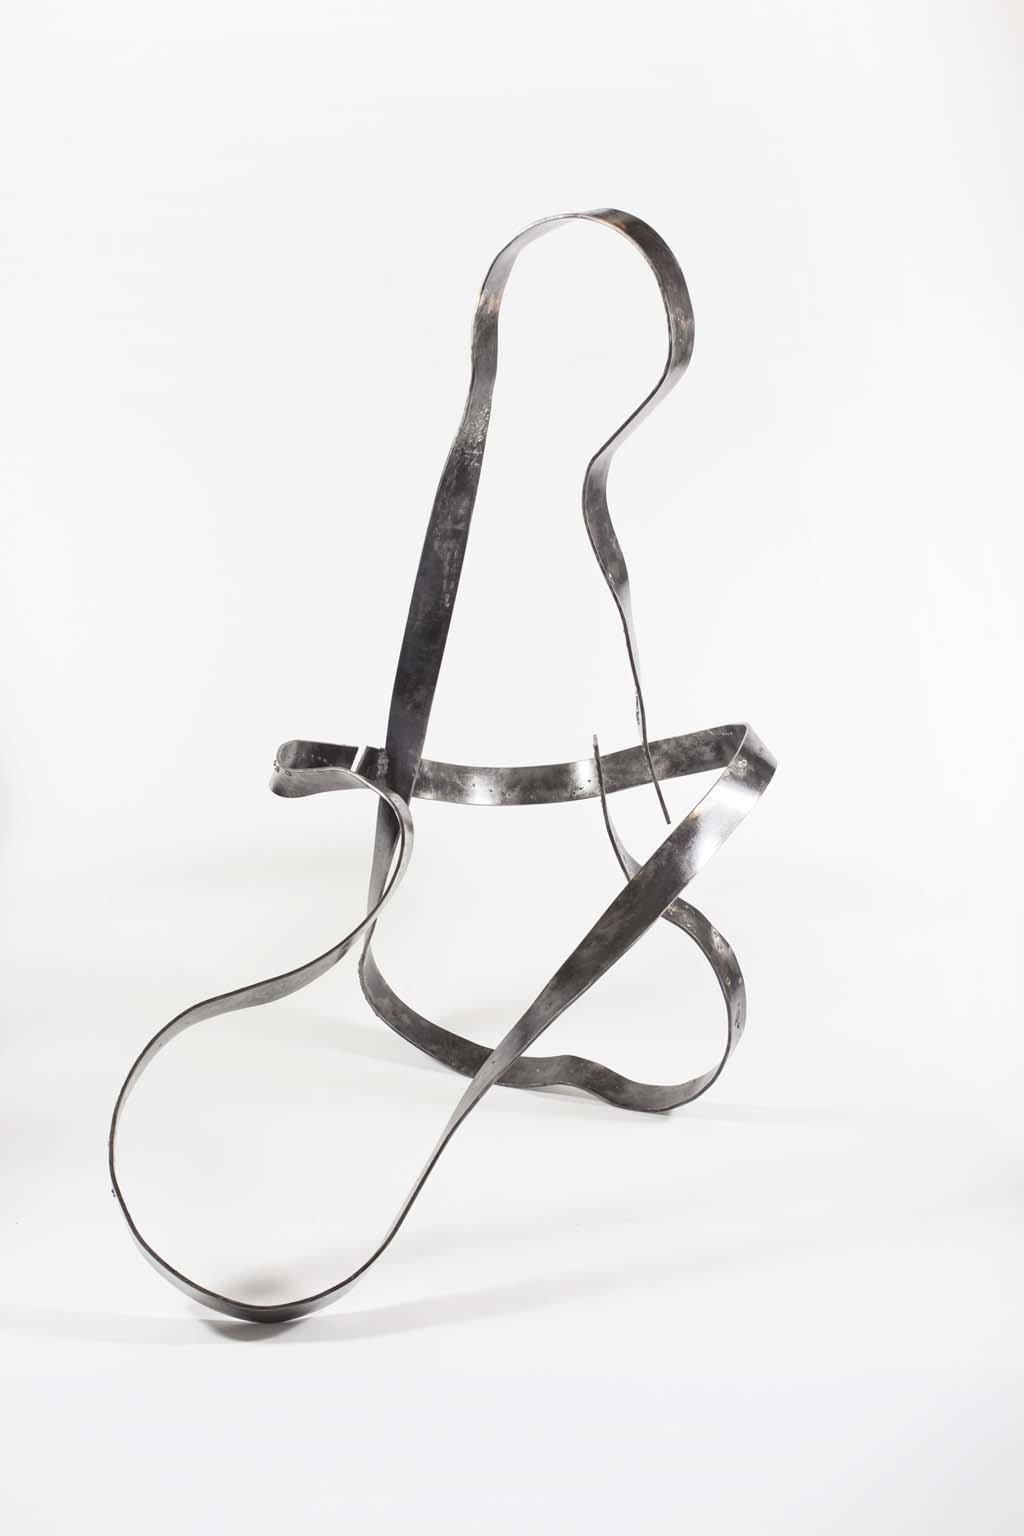 Oblivion VIII | 2017 | 160x160x60 cm |  Iron & brass sculpture | Rami Ater | רמי אטר